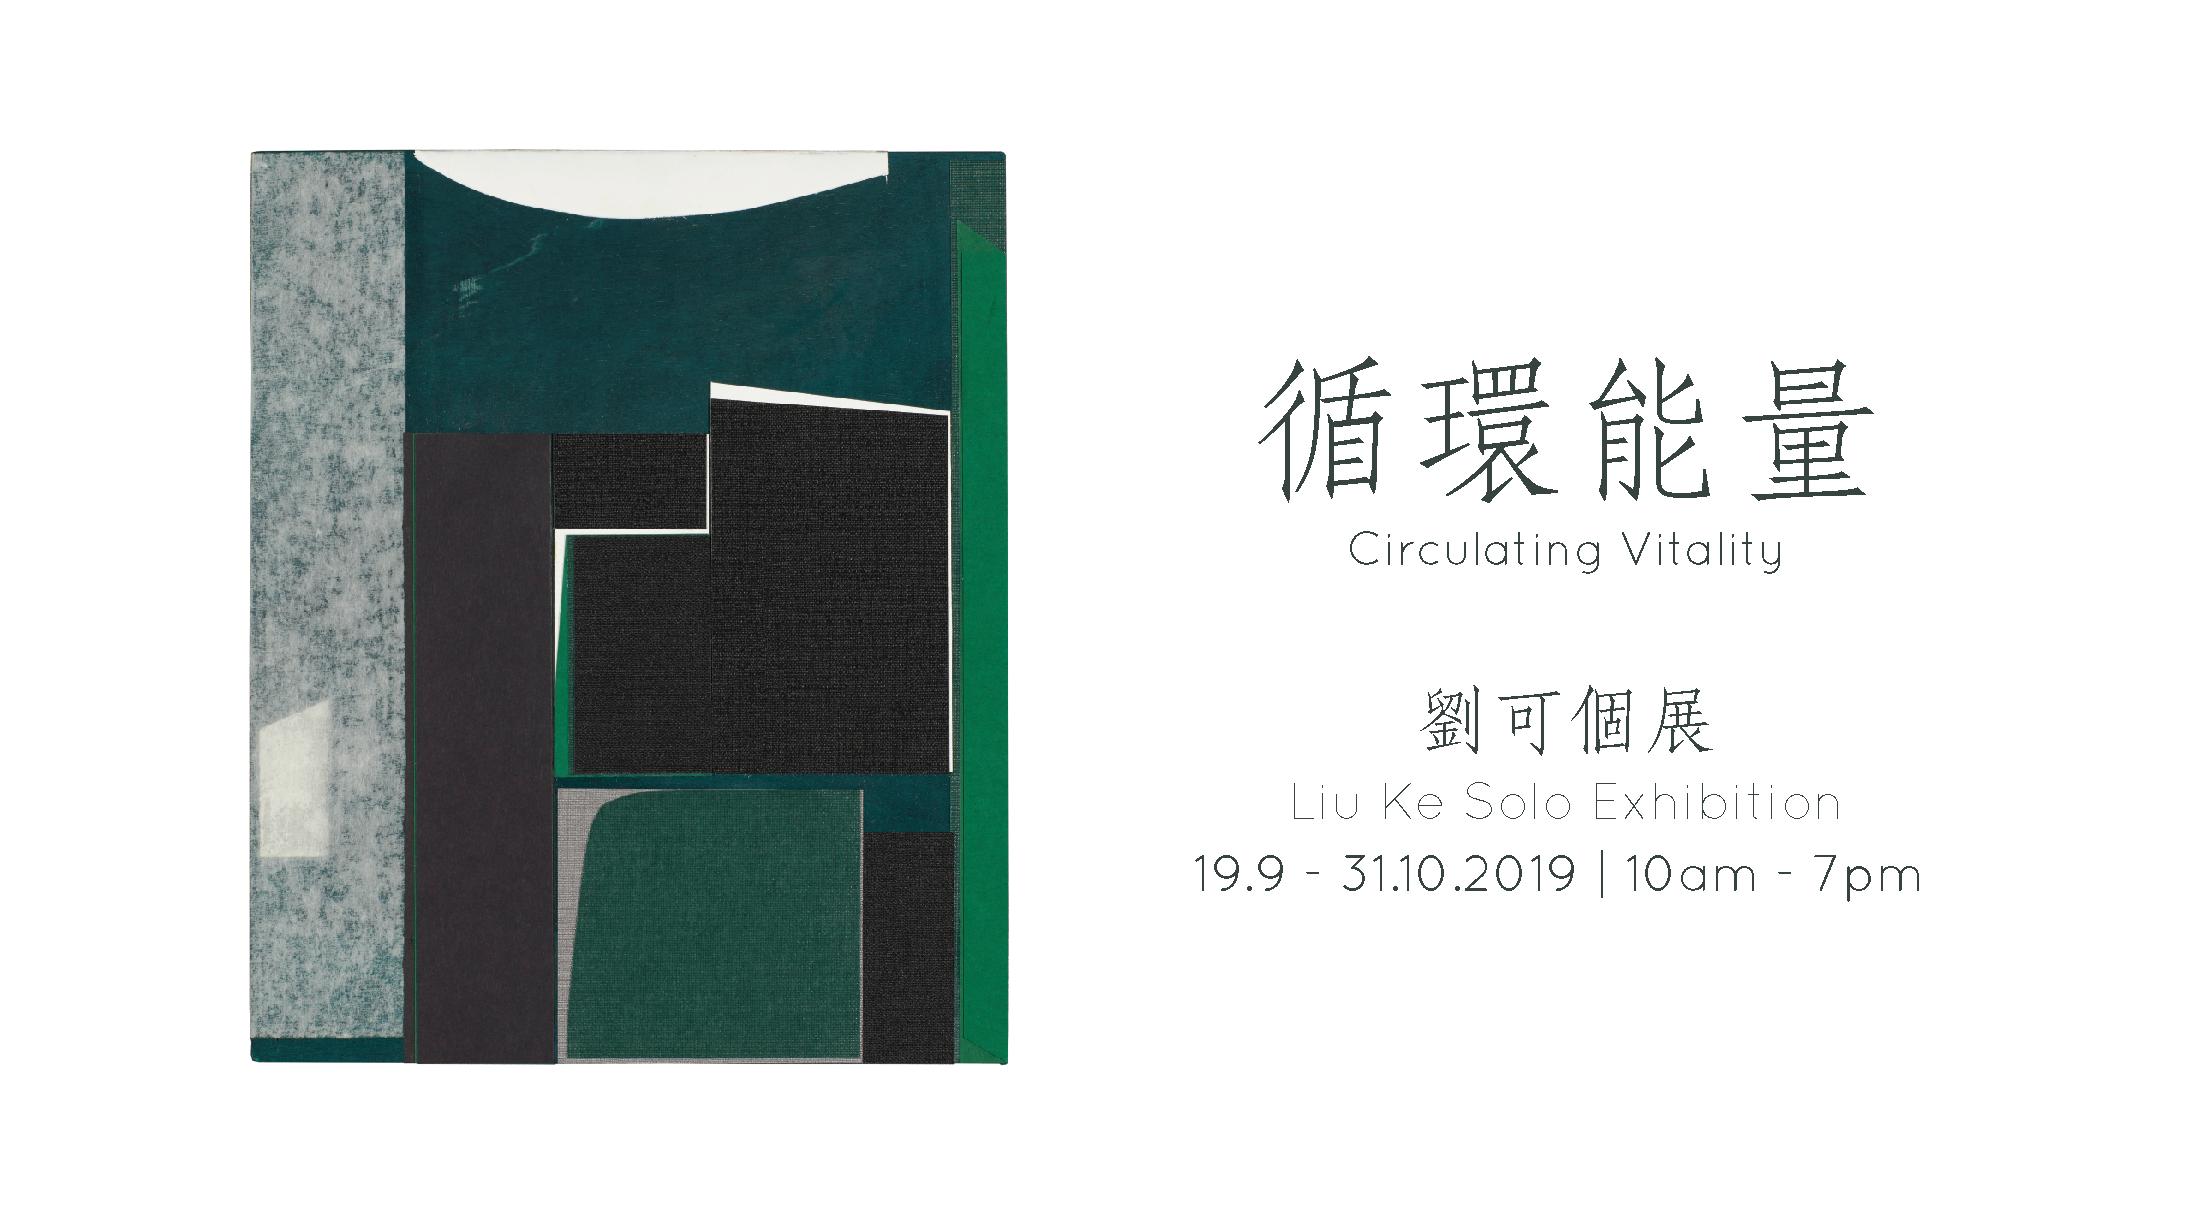 liu ke solo exhibition poster_banner-03.